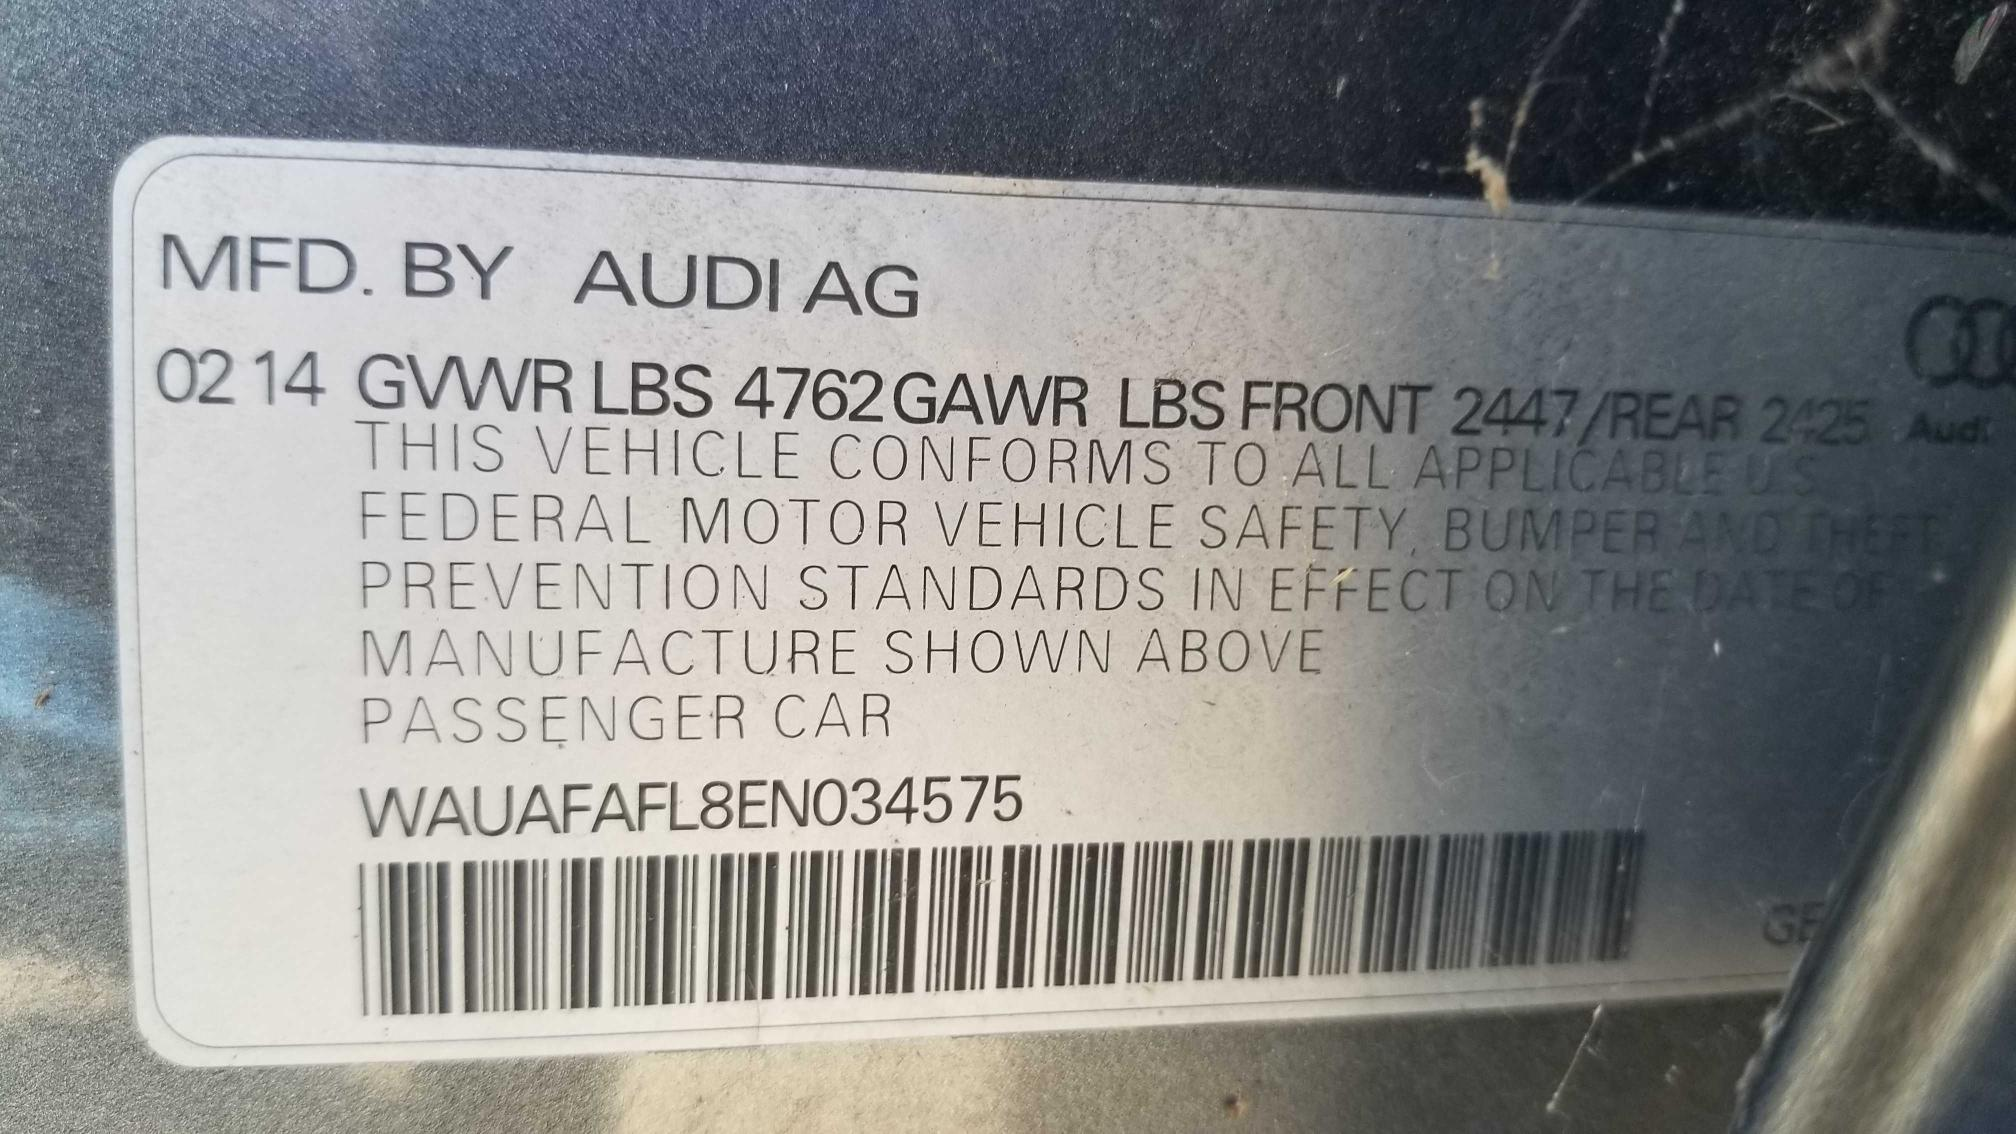 2014 AUDI A4 PREMIUM WAUAFAFL8EN034575